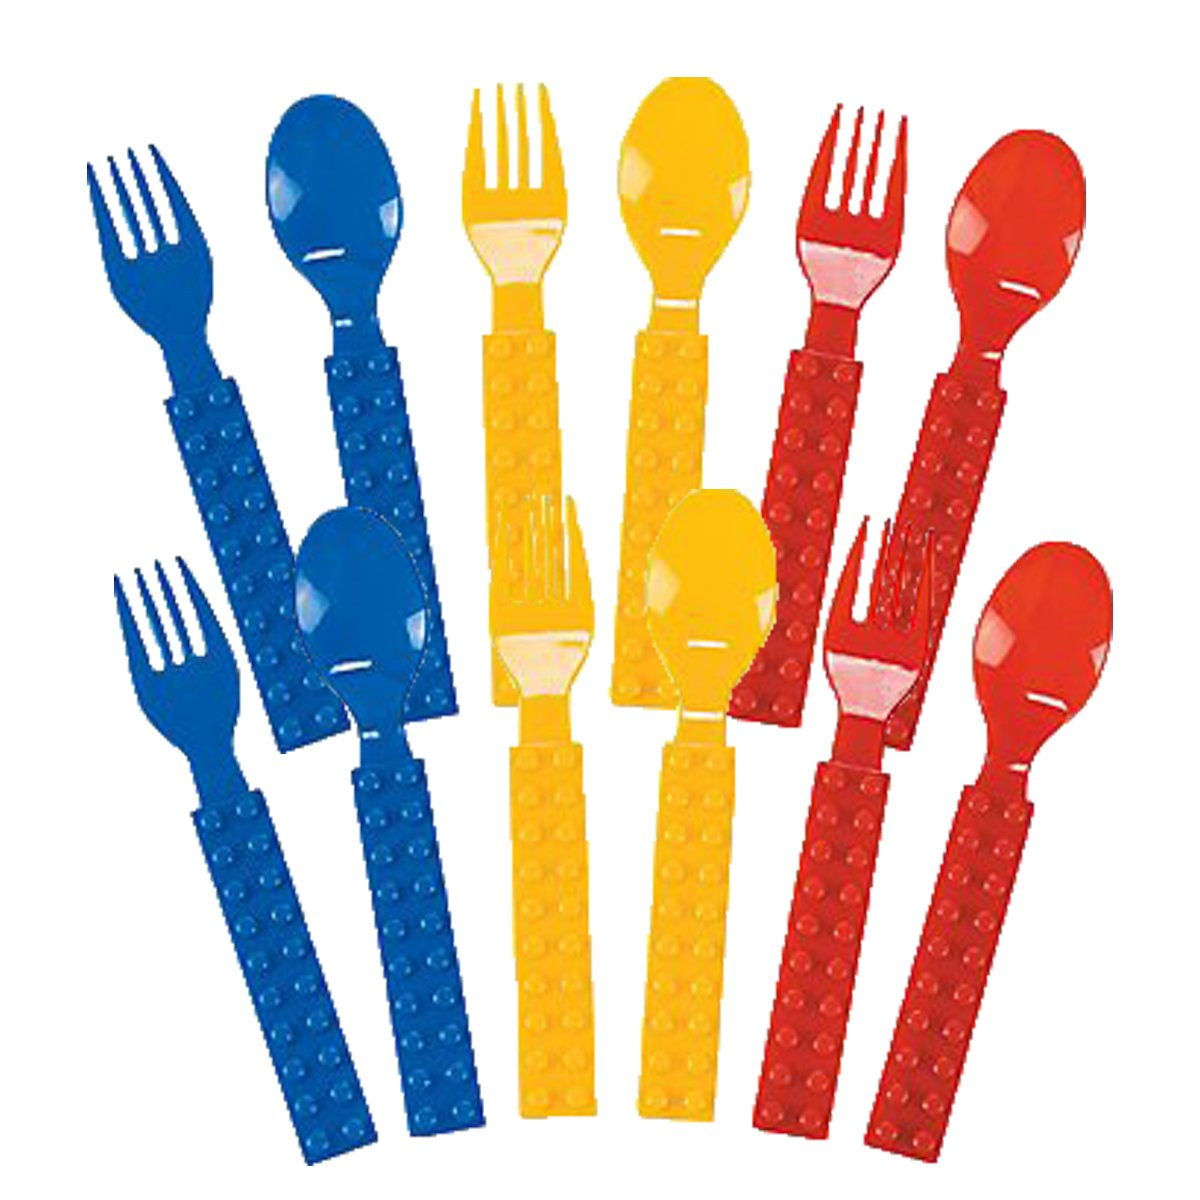 Fun Express Plastic Color Brick Party Fork & Spoon Set - 32 pcs by Fun Express